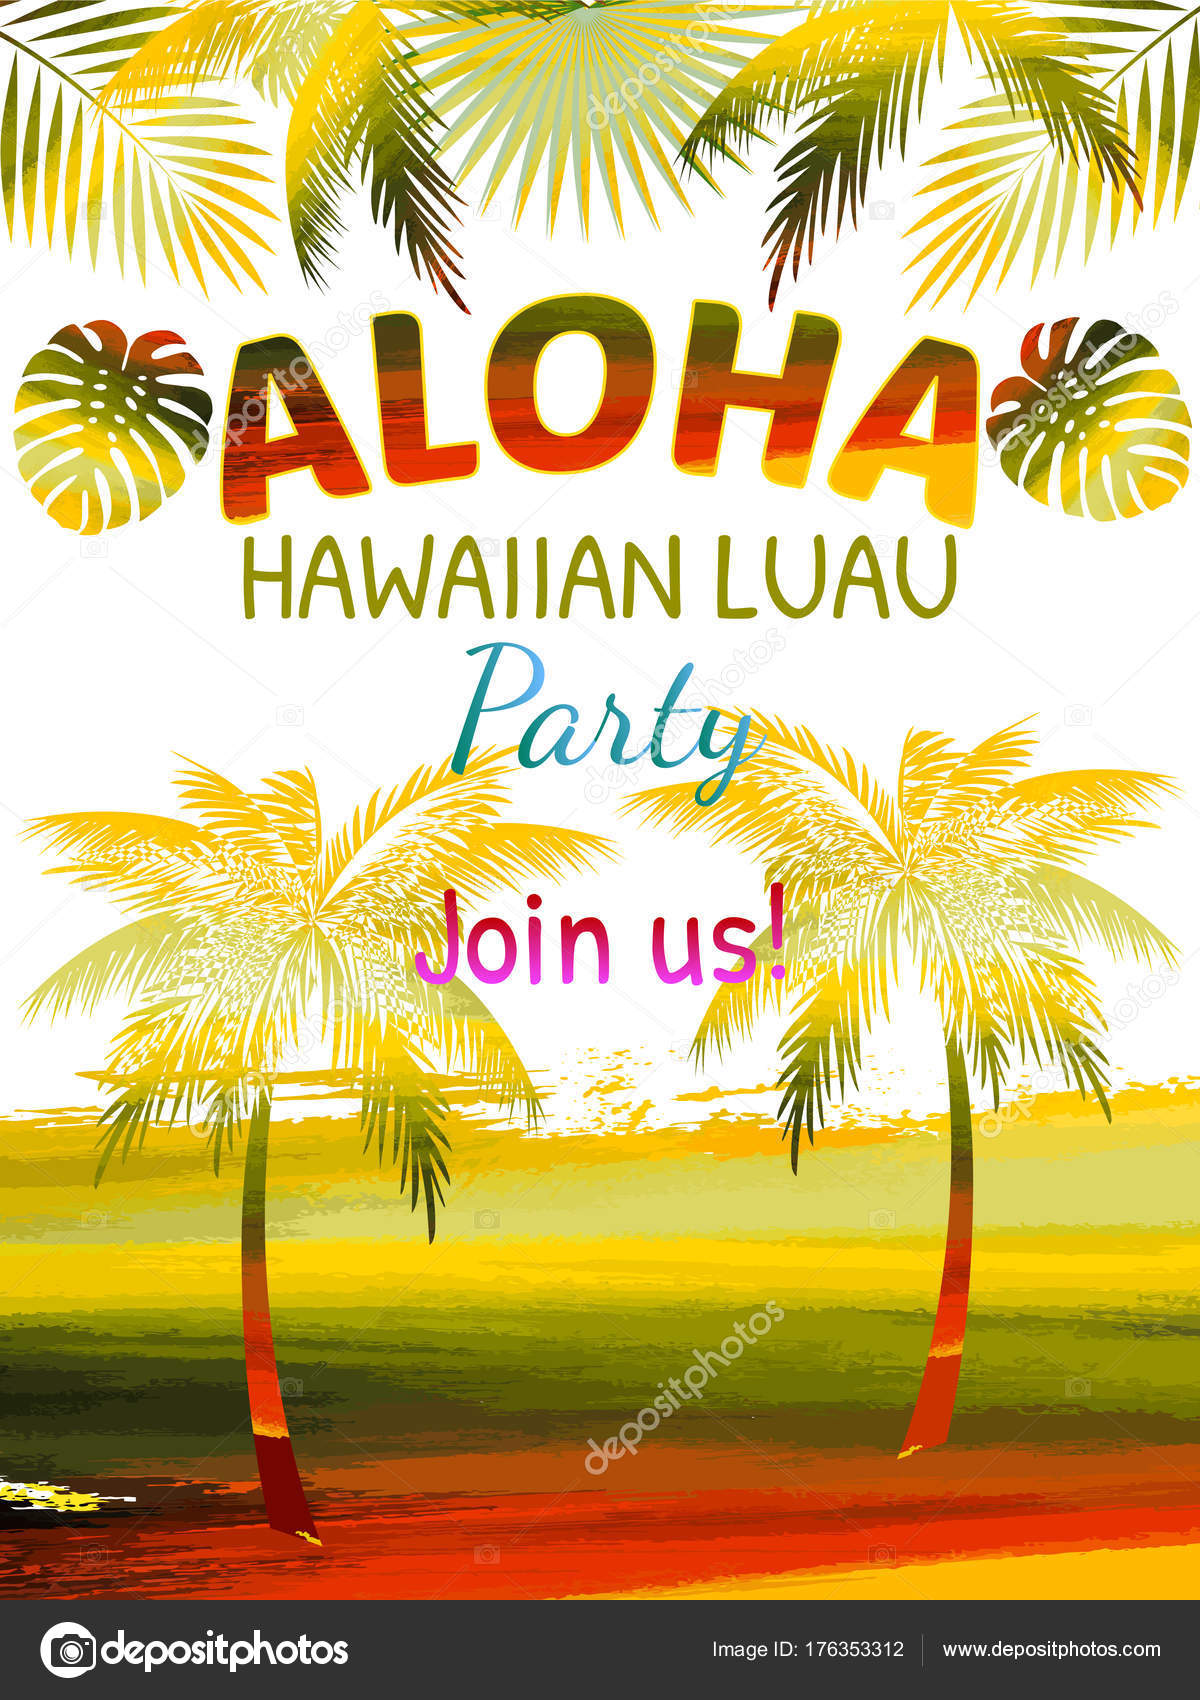 Blank Luau Party Invitations